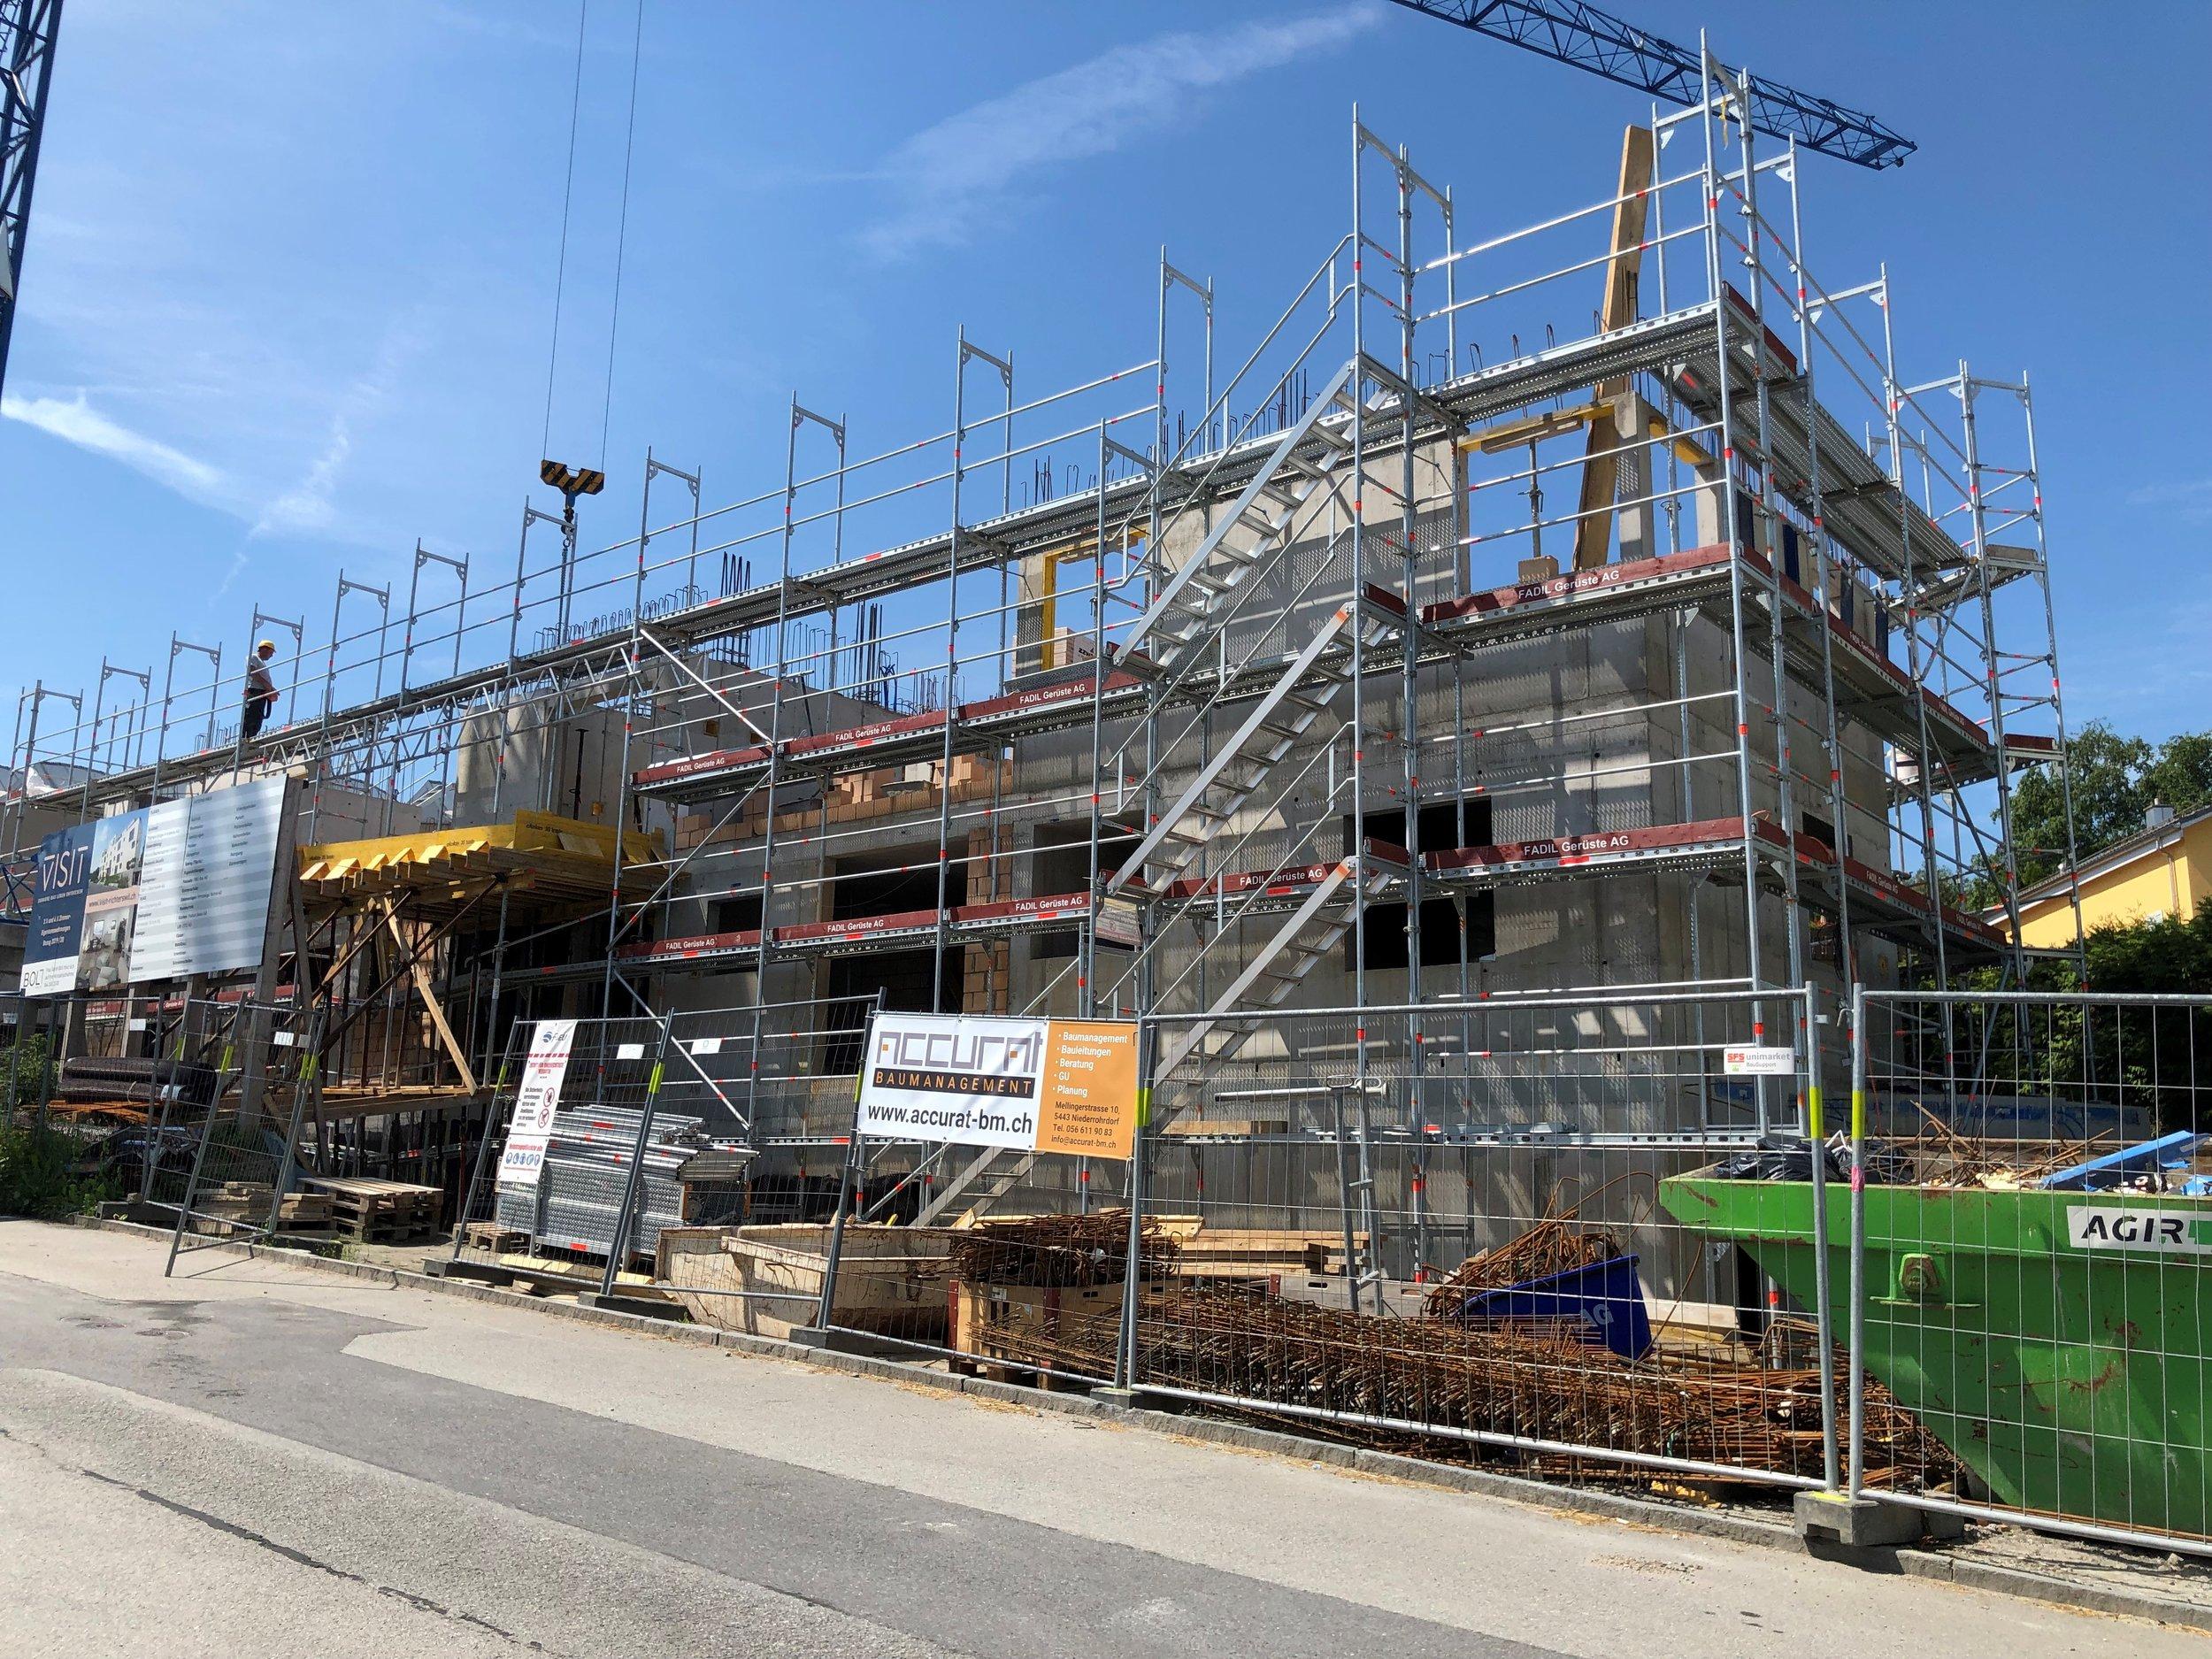 VISIT - Baustelle Neubauprojekt Boll Immobilien Immobilie verkauft Richterswil